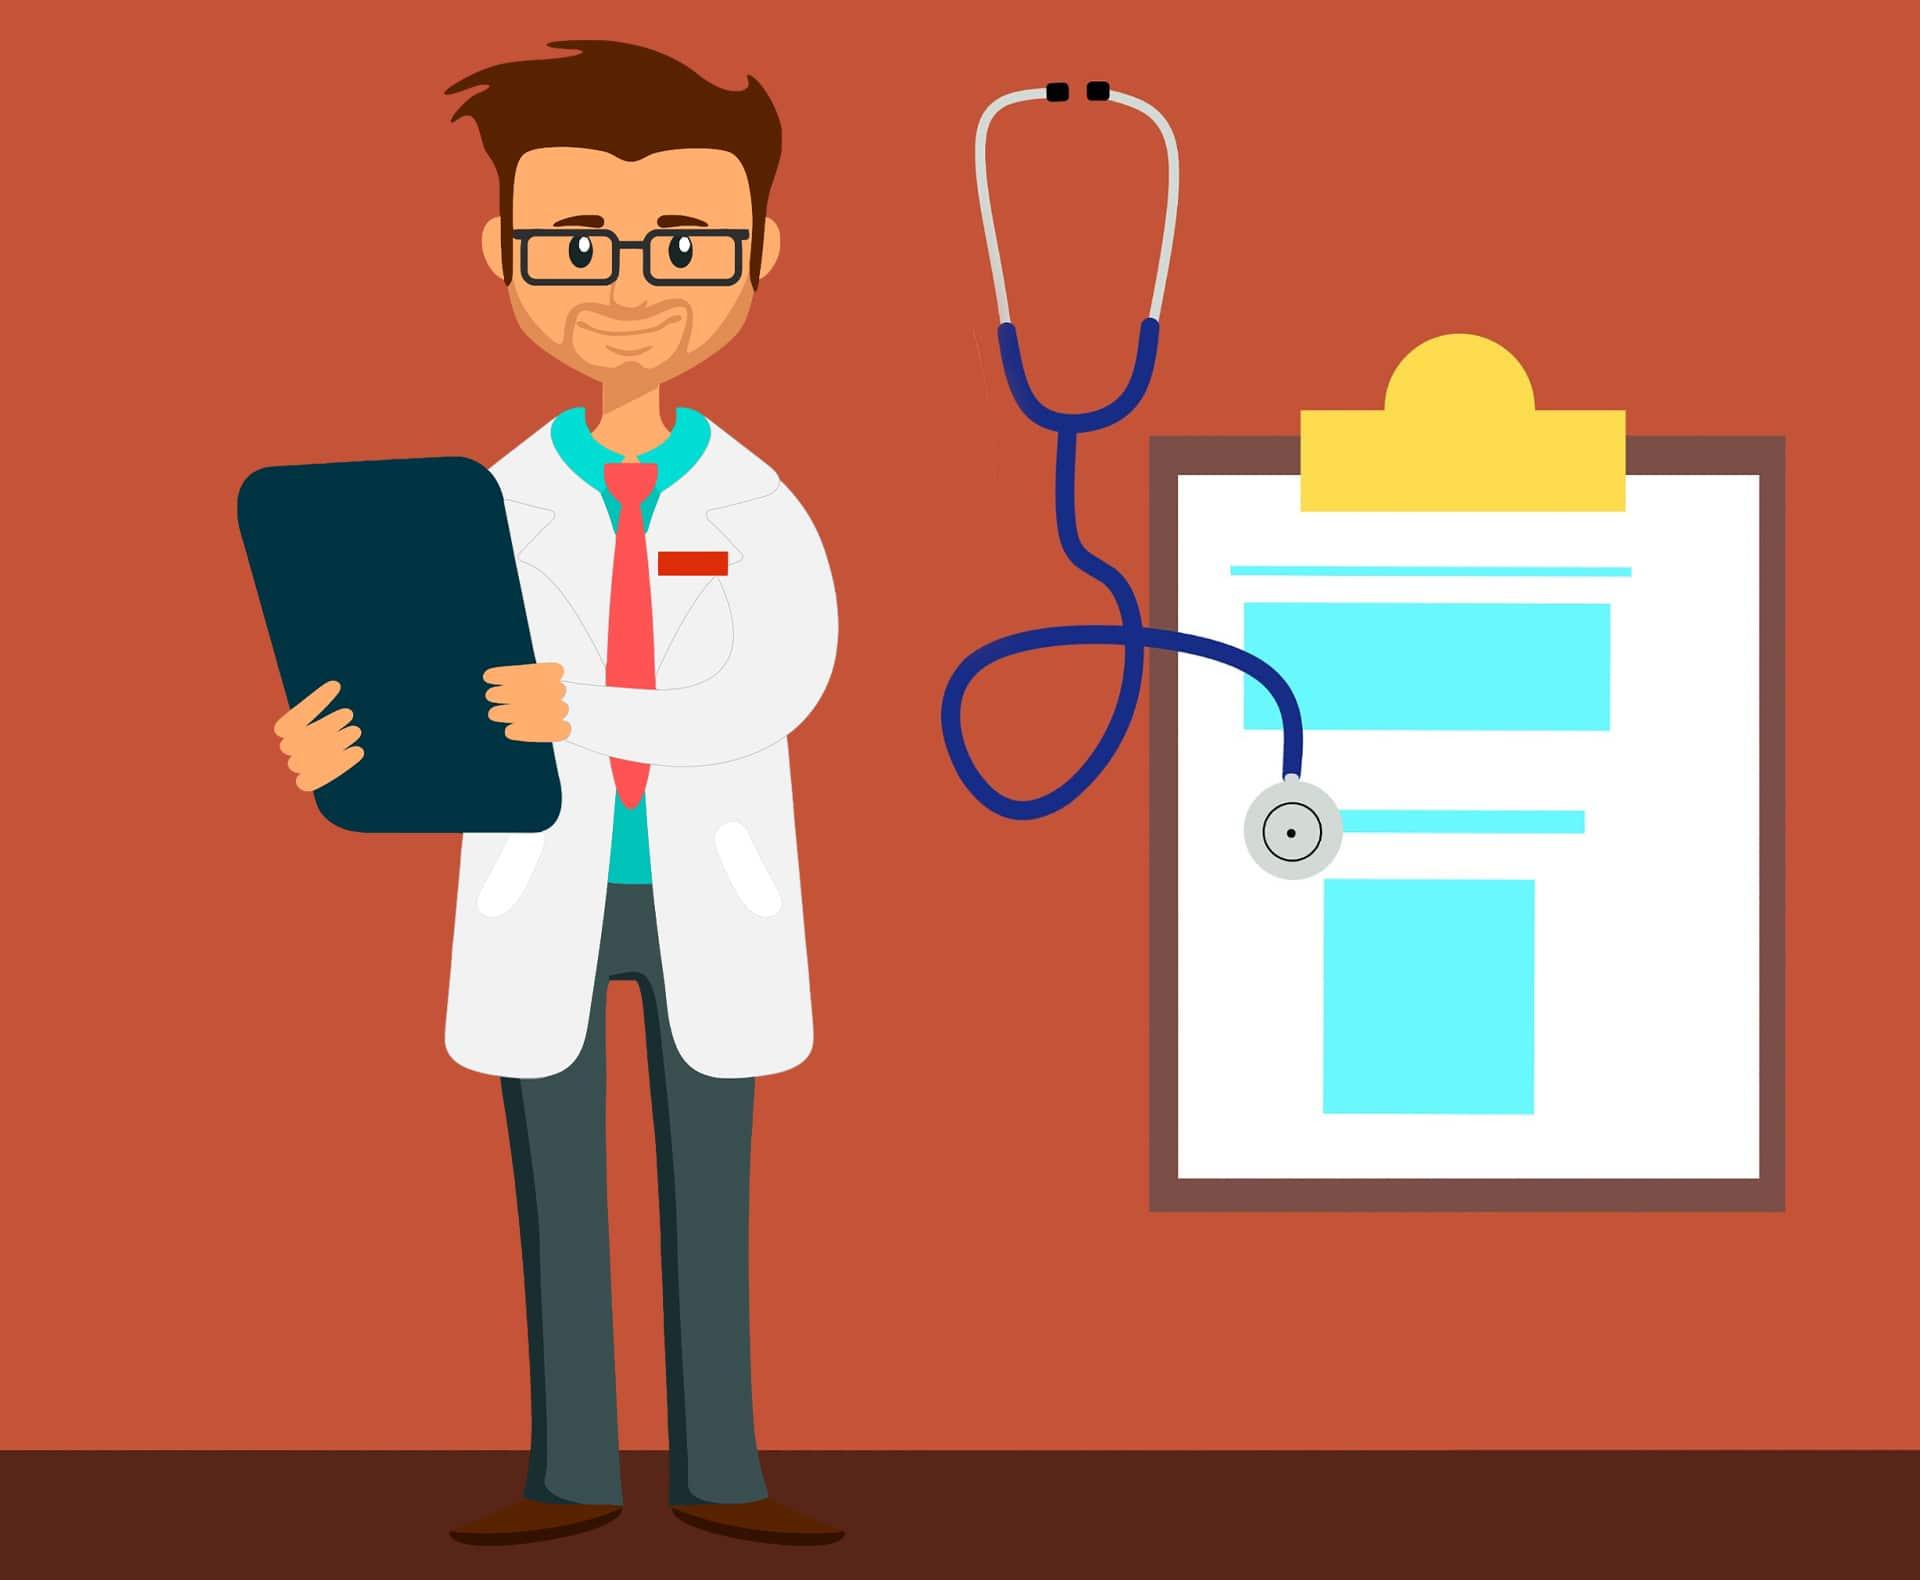 Health Checkup - Doctor